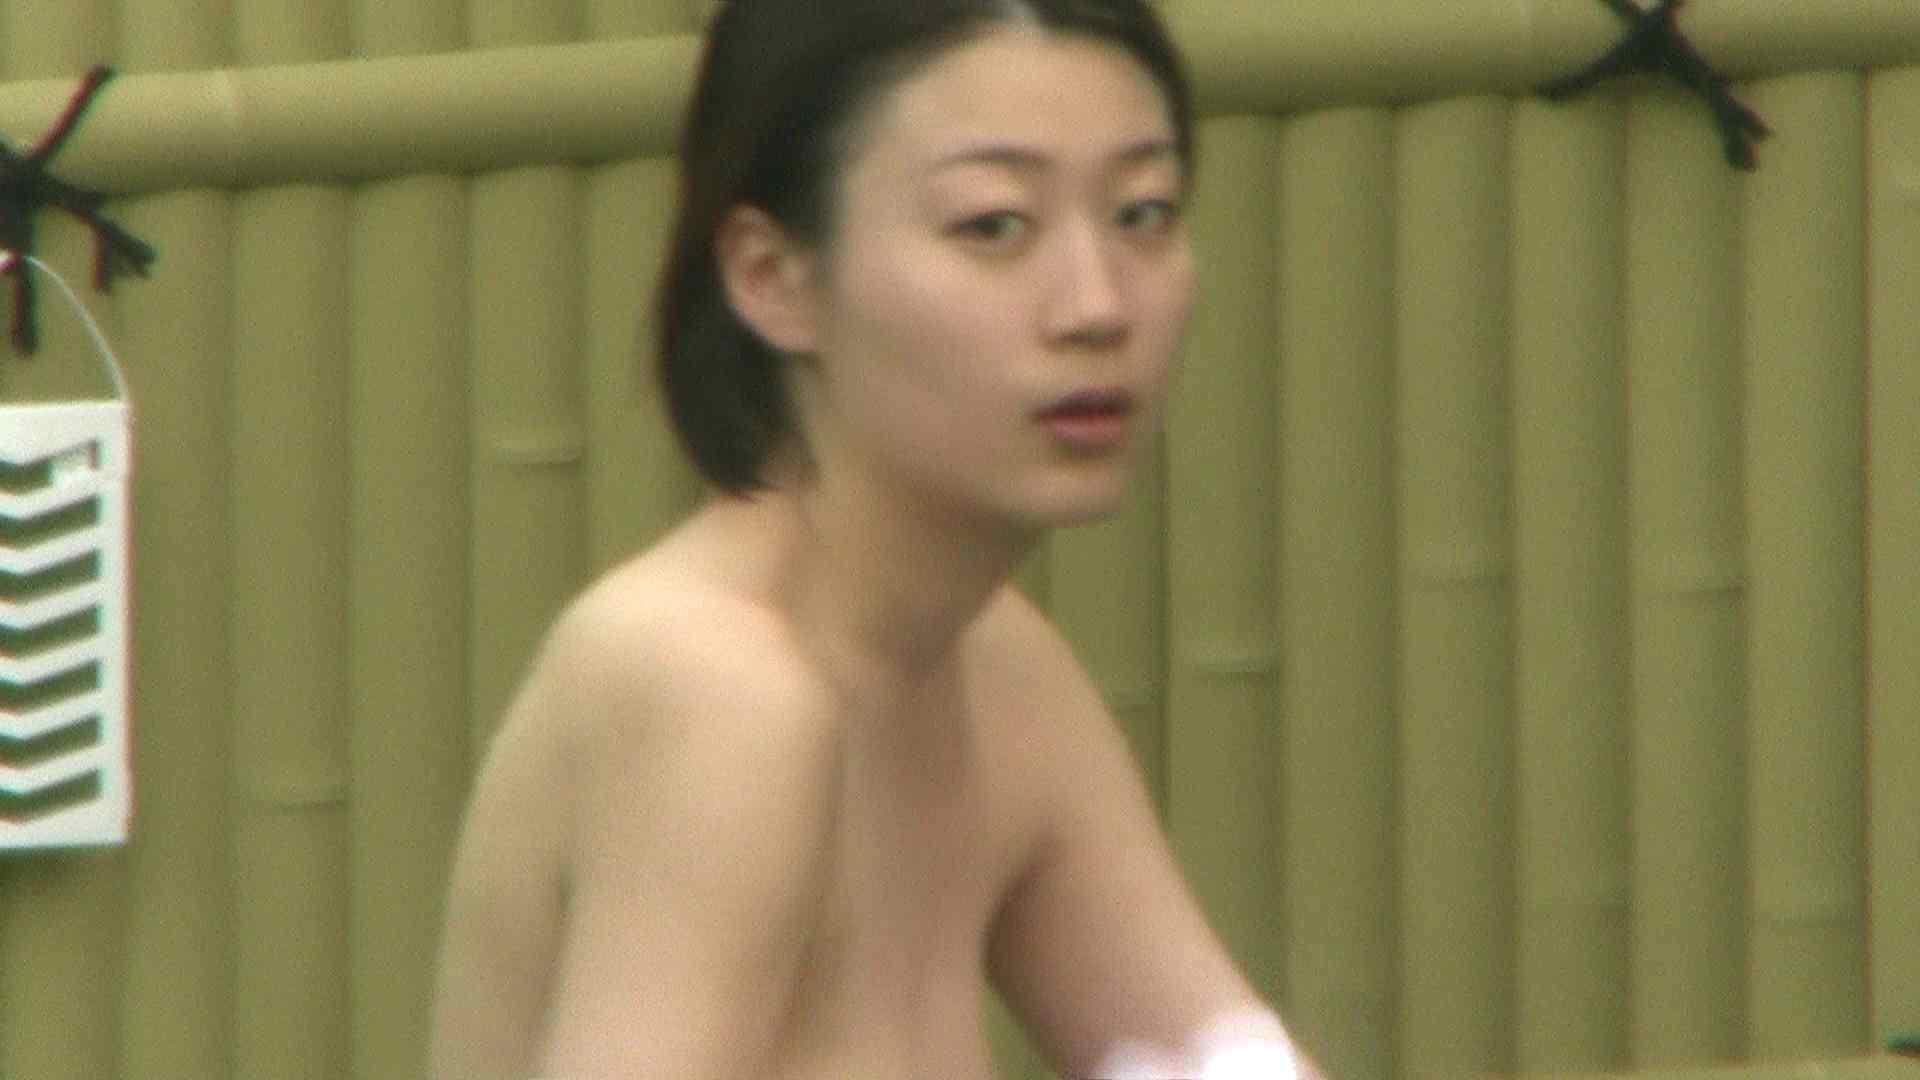 Aquaな露天風呂Vol.123 美しいOLの裸体 | 露天風呂突入  105pic 100